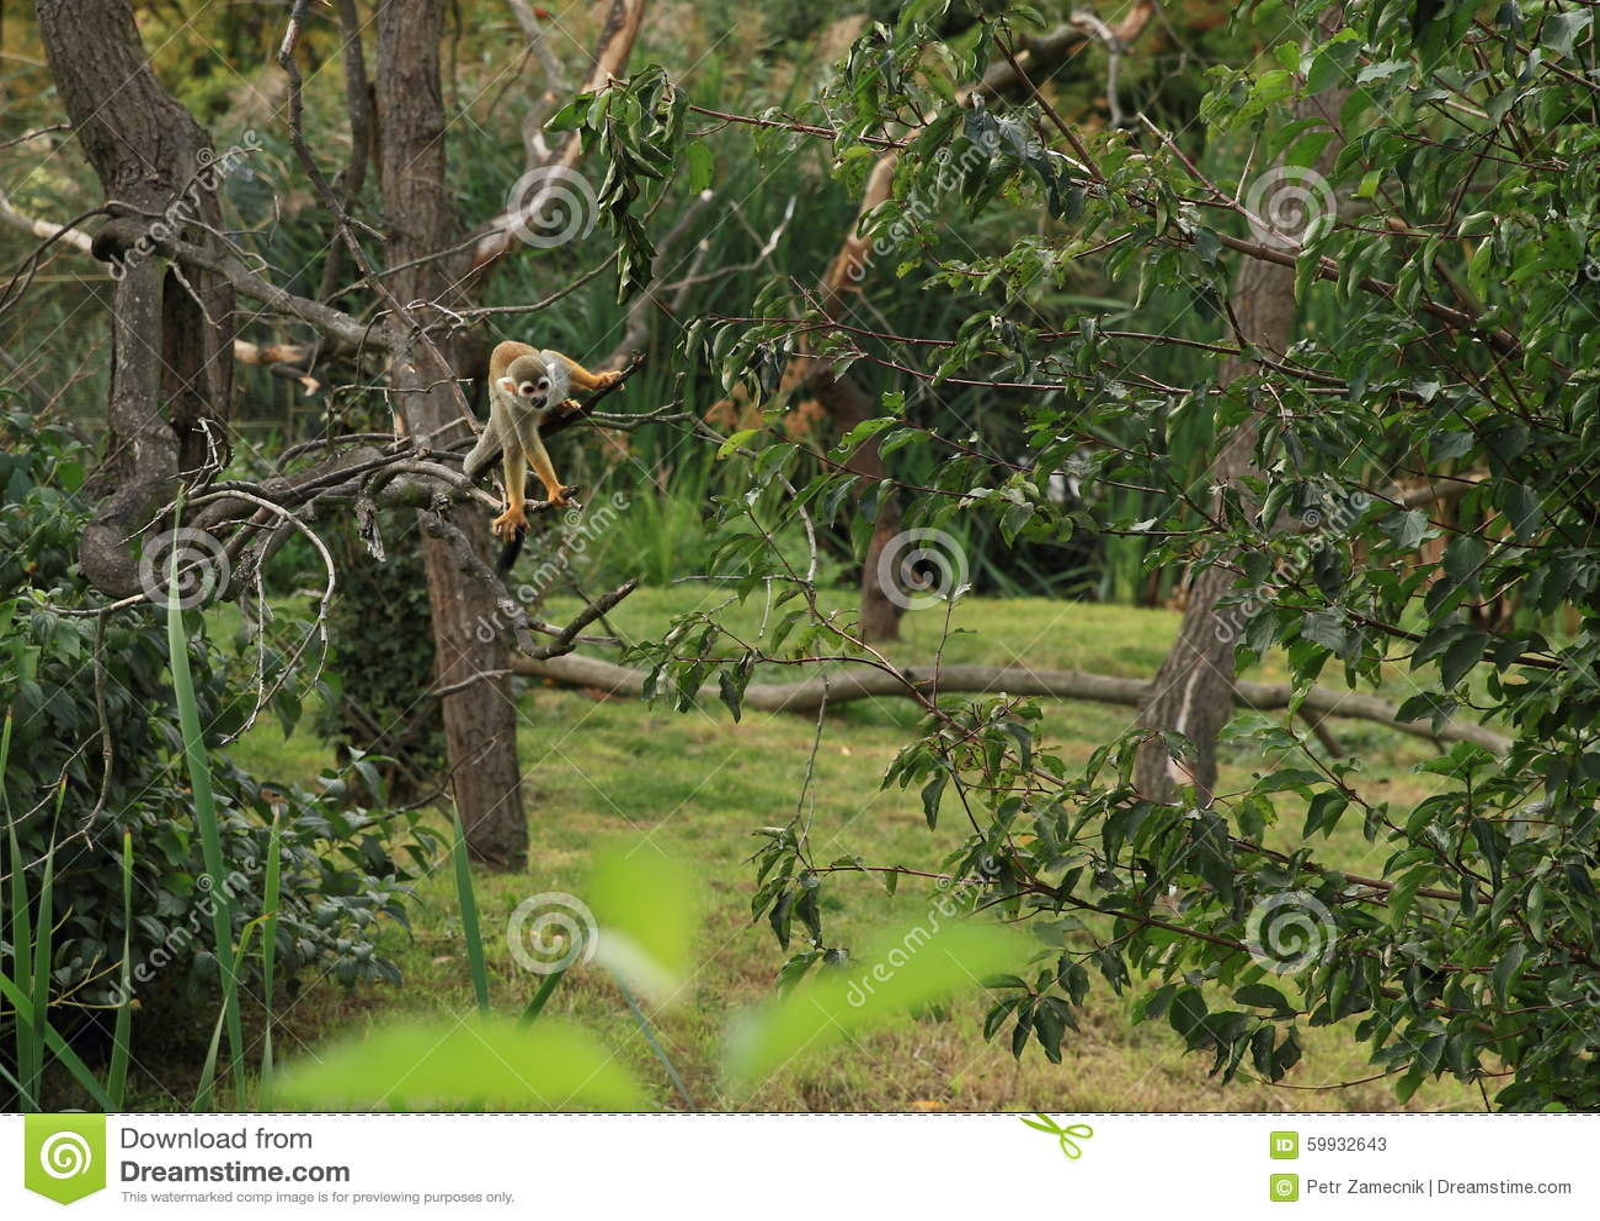 Squirrel monkeys in trees - photo#15